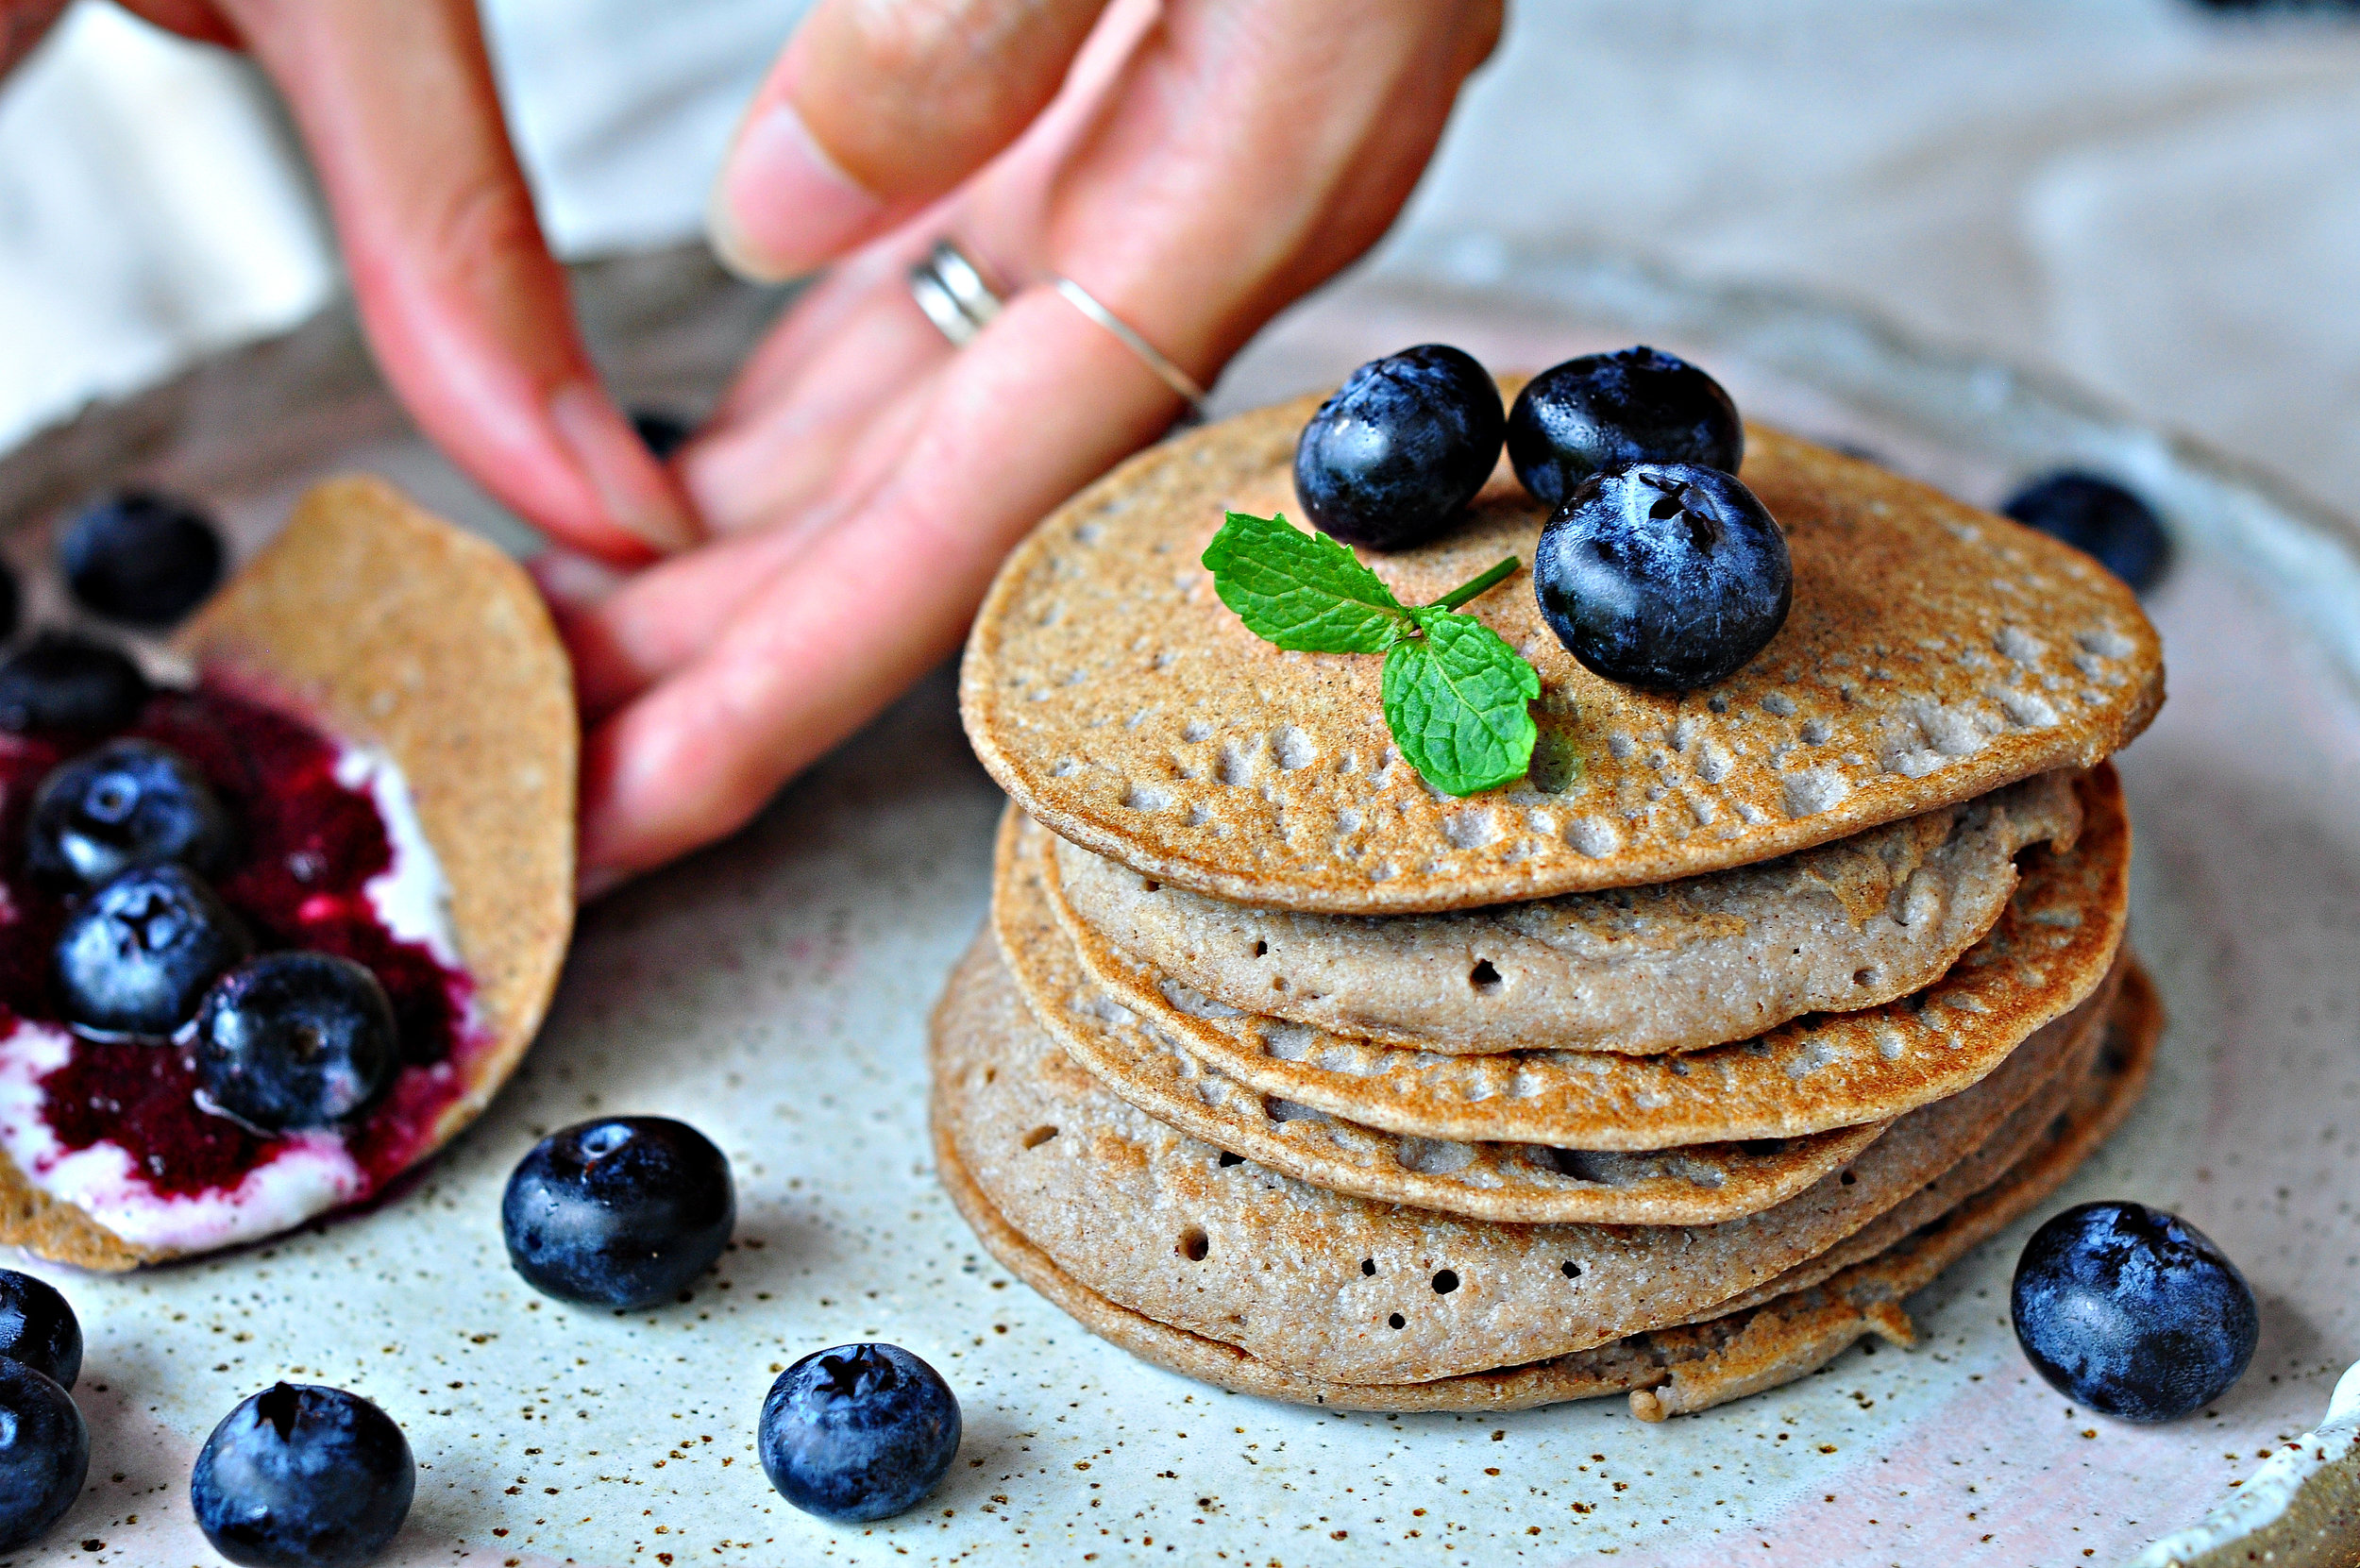 Copy of Pancakes - All .jpg